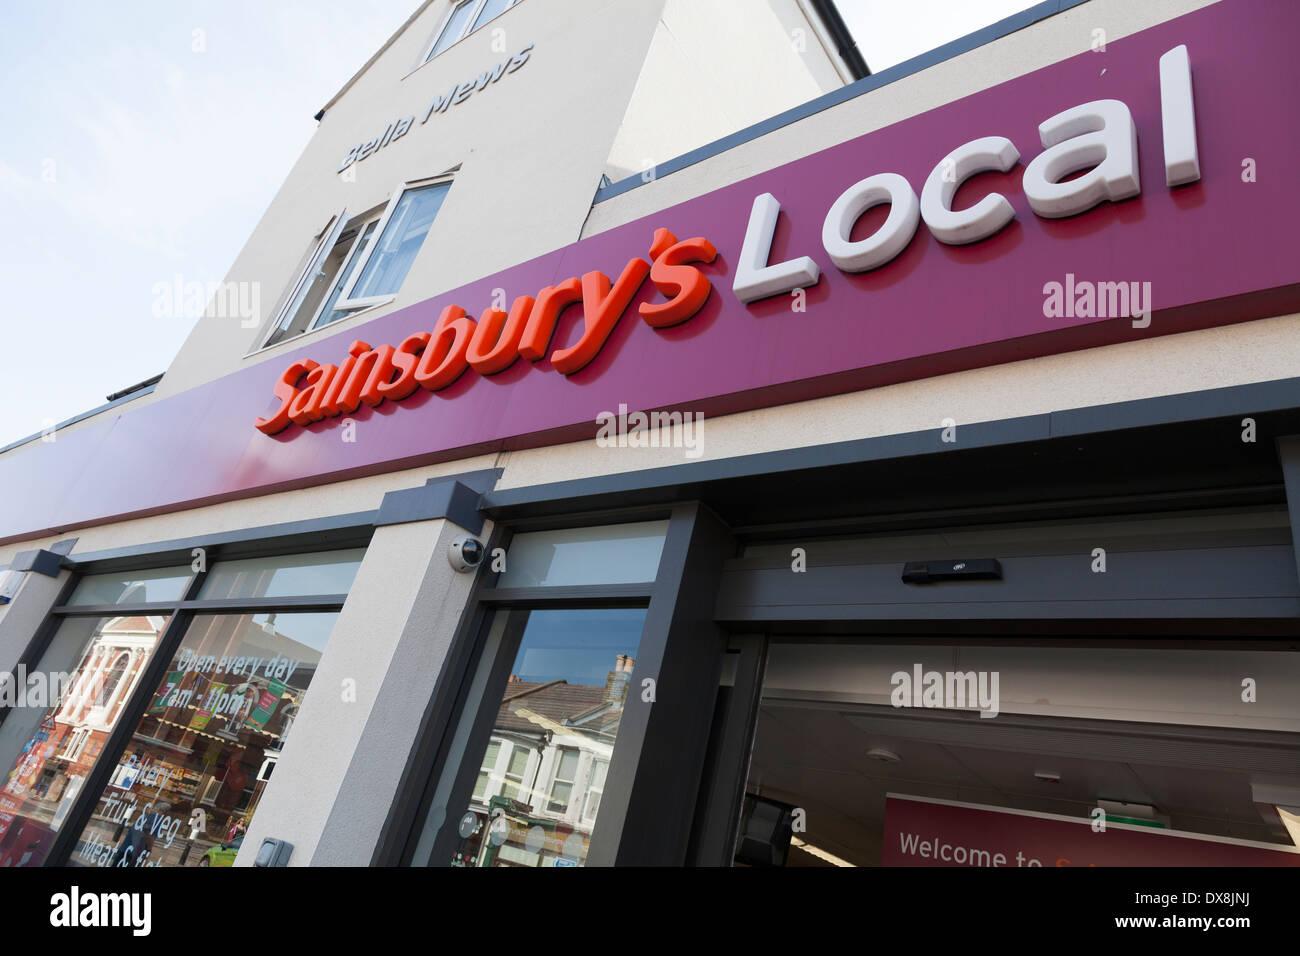 Sainsbury Local shop signage exterior. - Stock Image